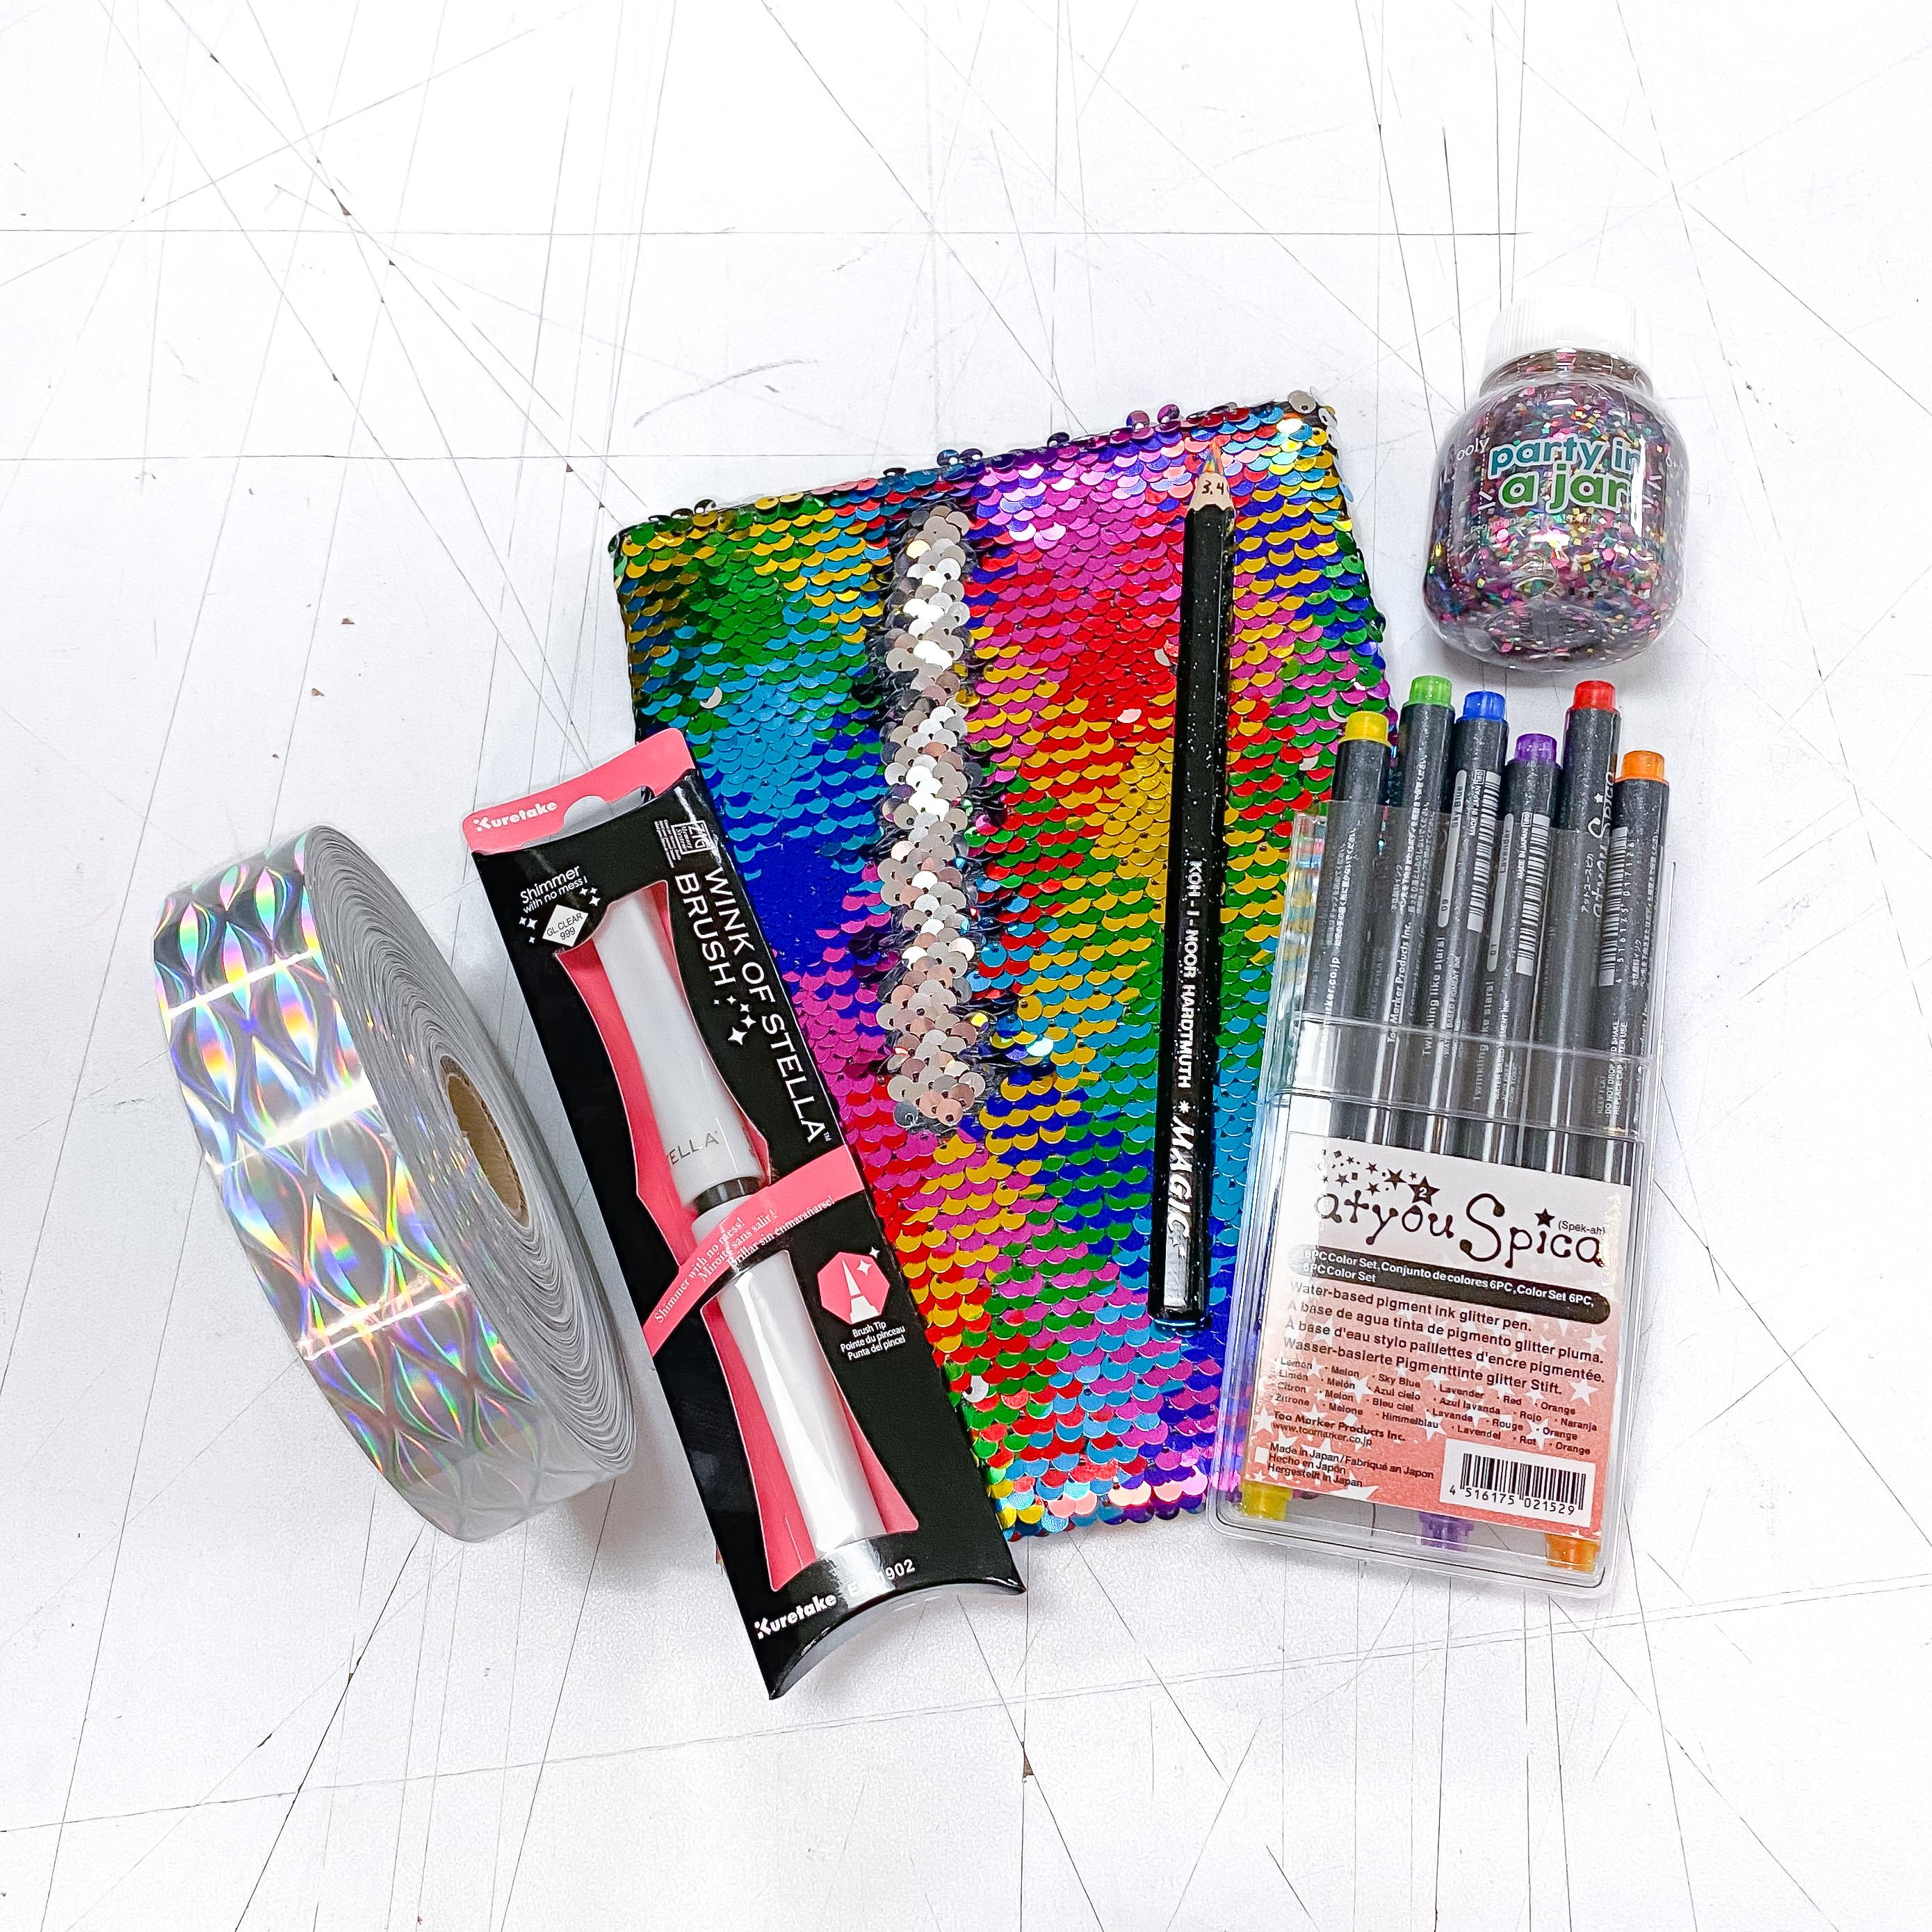 The ULTIMATE Glitter Sparkle Rainbow Kit!